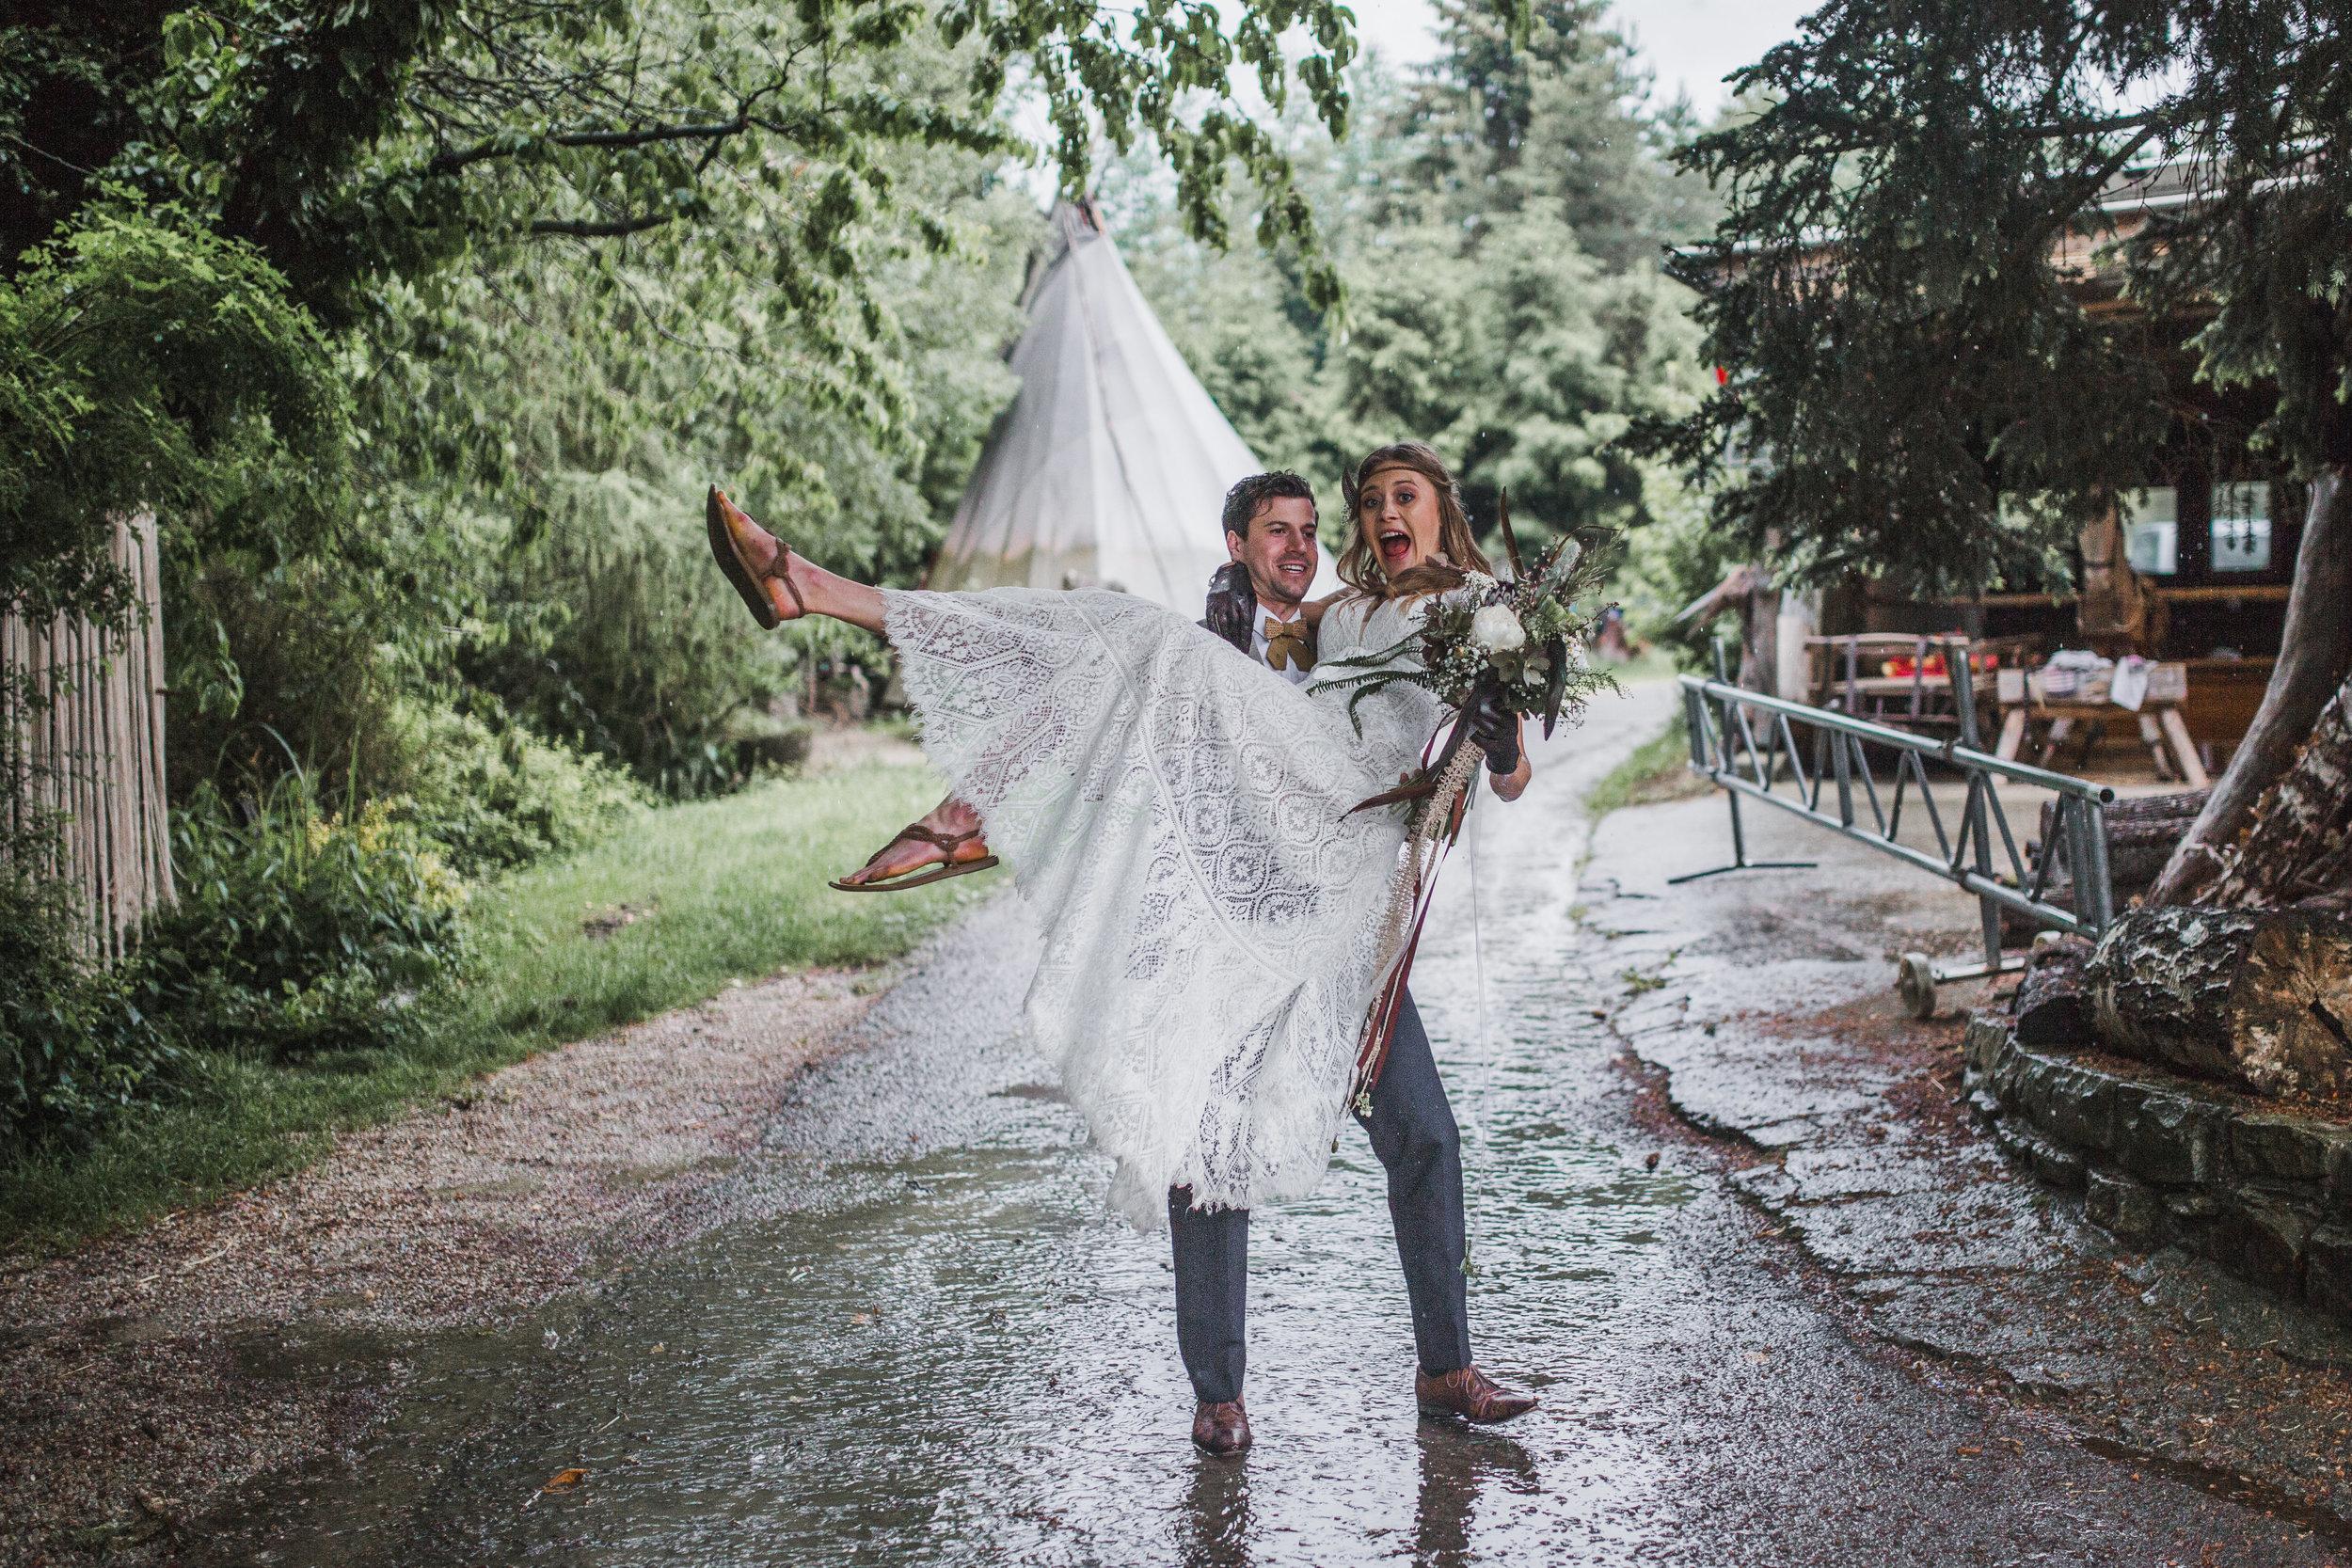 yessica-baur-fotografie-styleshooting-indianer-pfullingen-7868.JPG